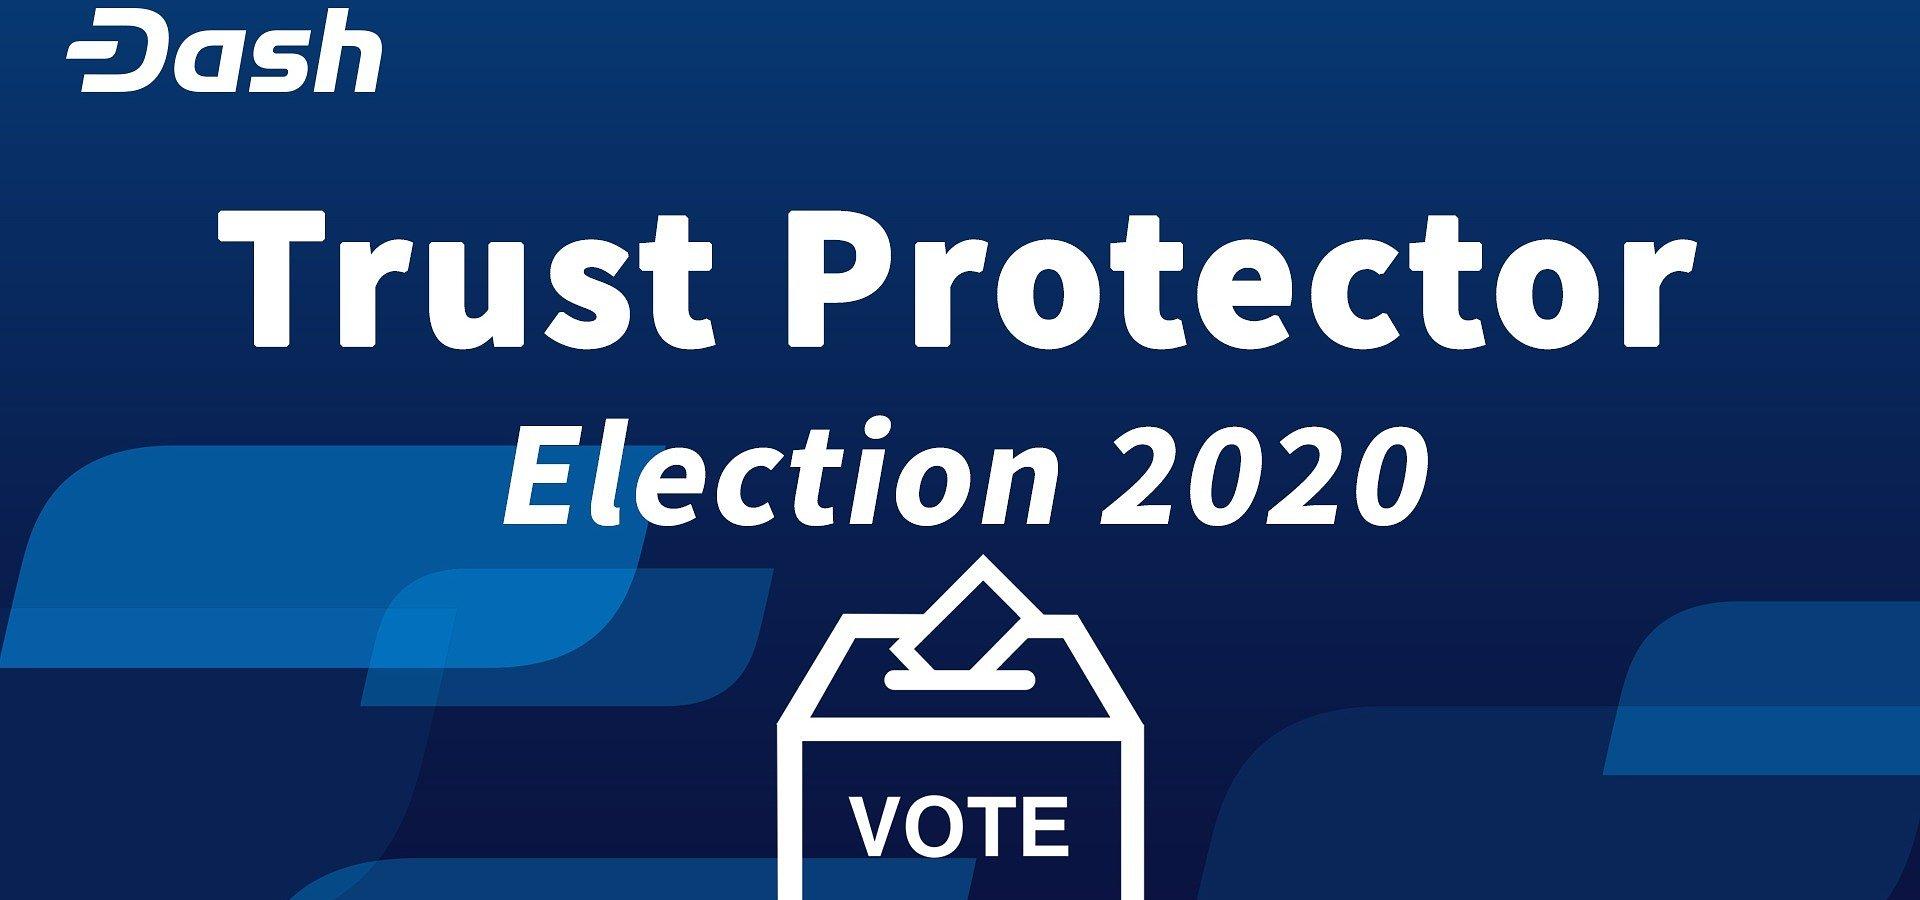 Dash Trust Protectors Election 2020